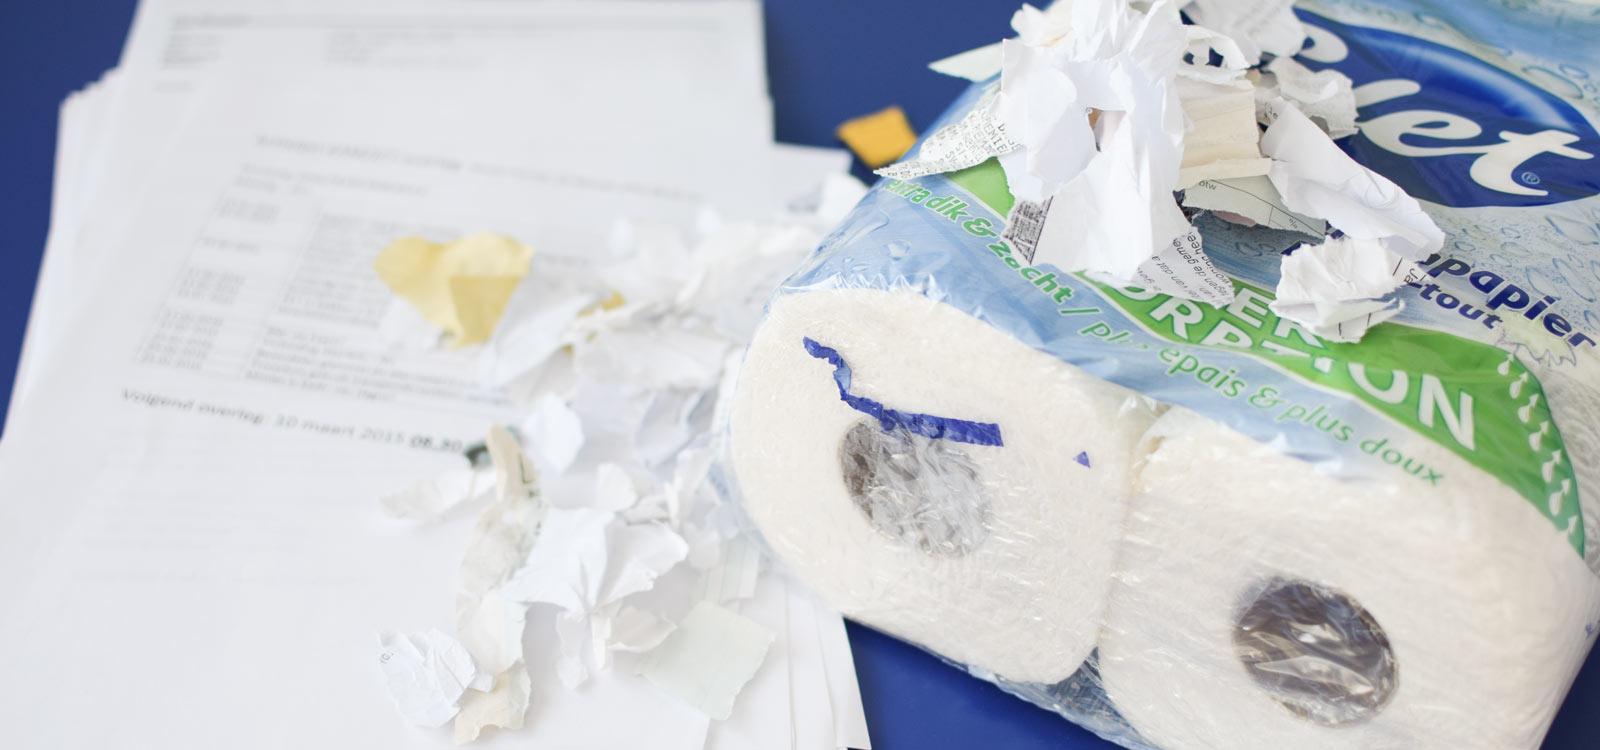 Papiervernietiging-en-papierrecycling-wcpapier-header-fnoi